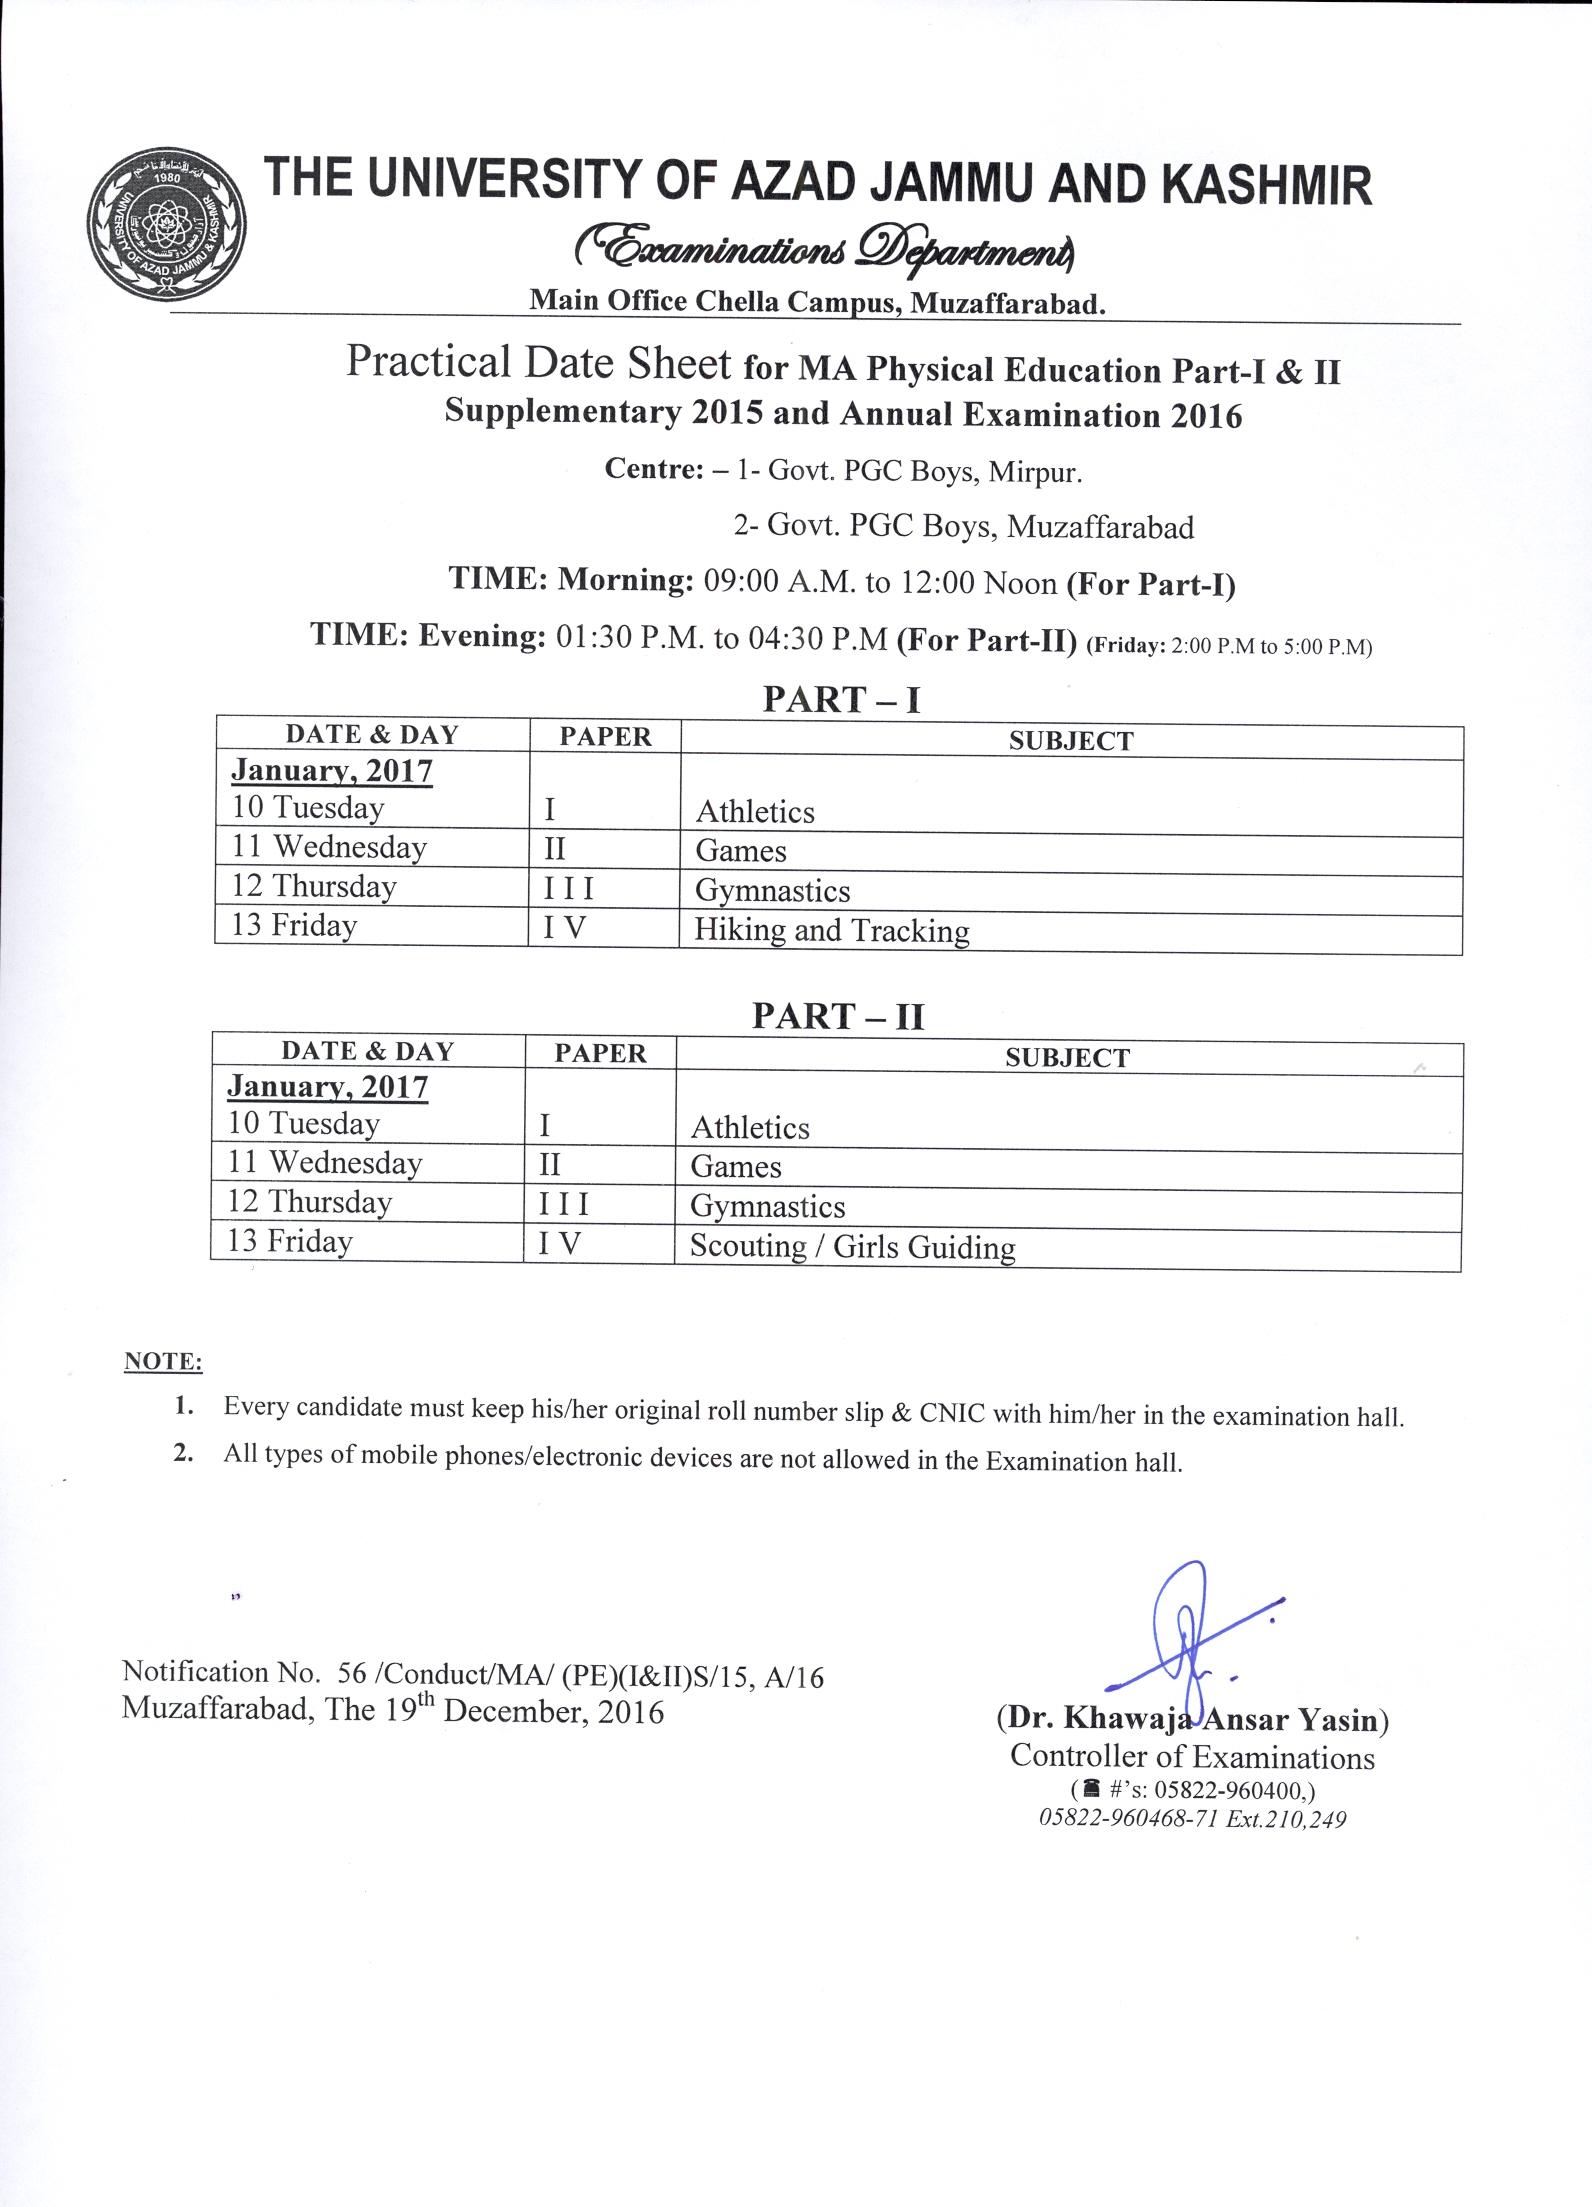 University of Azad Jammu and Kashmir Admission 2018 College, School, University Admissions